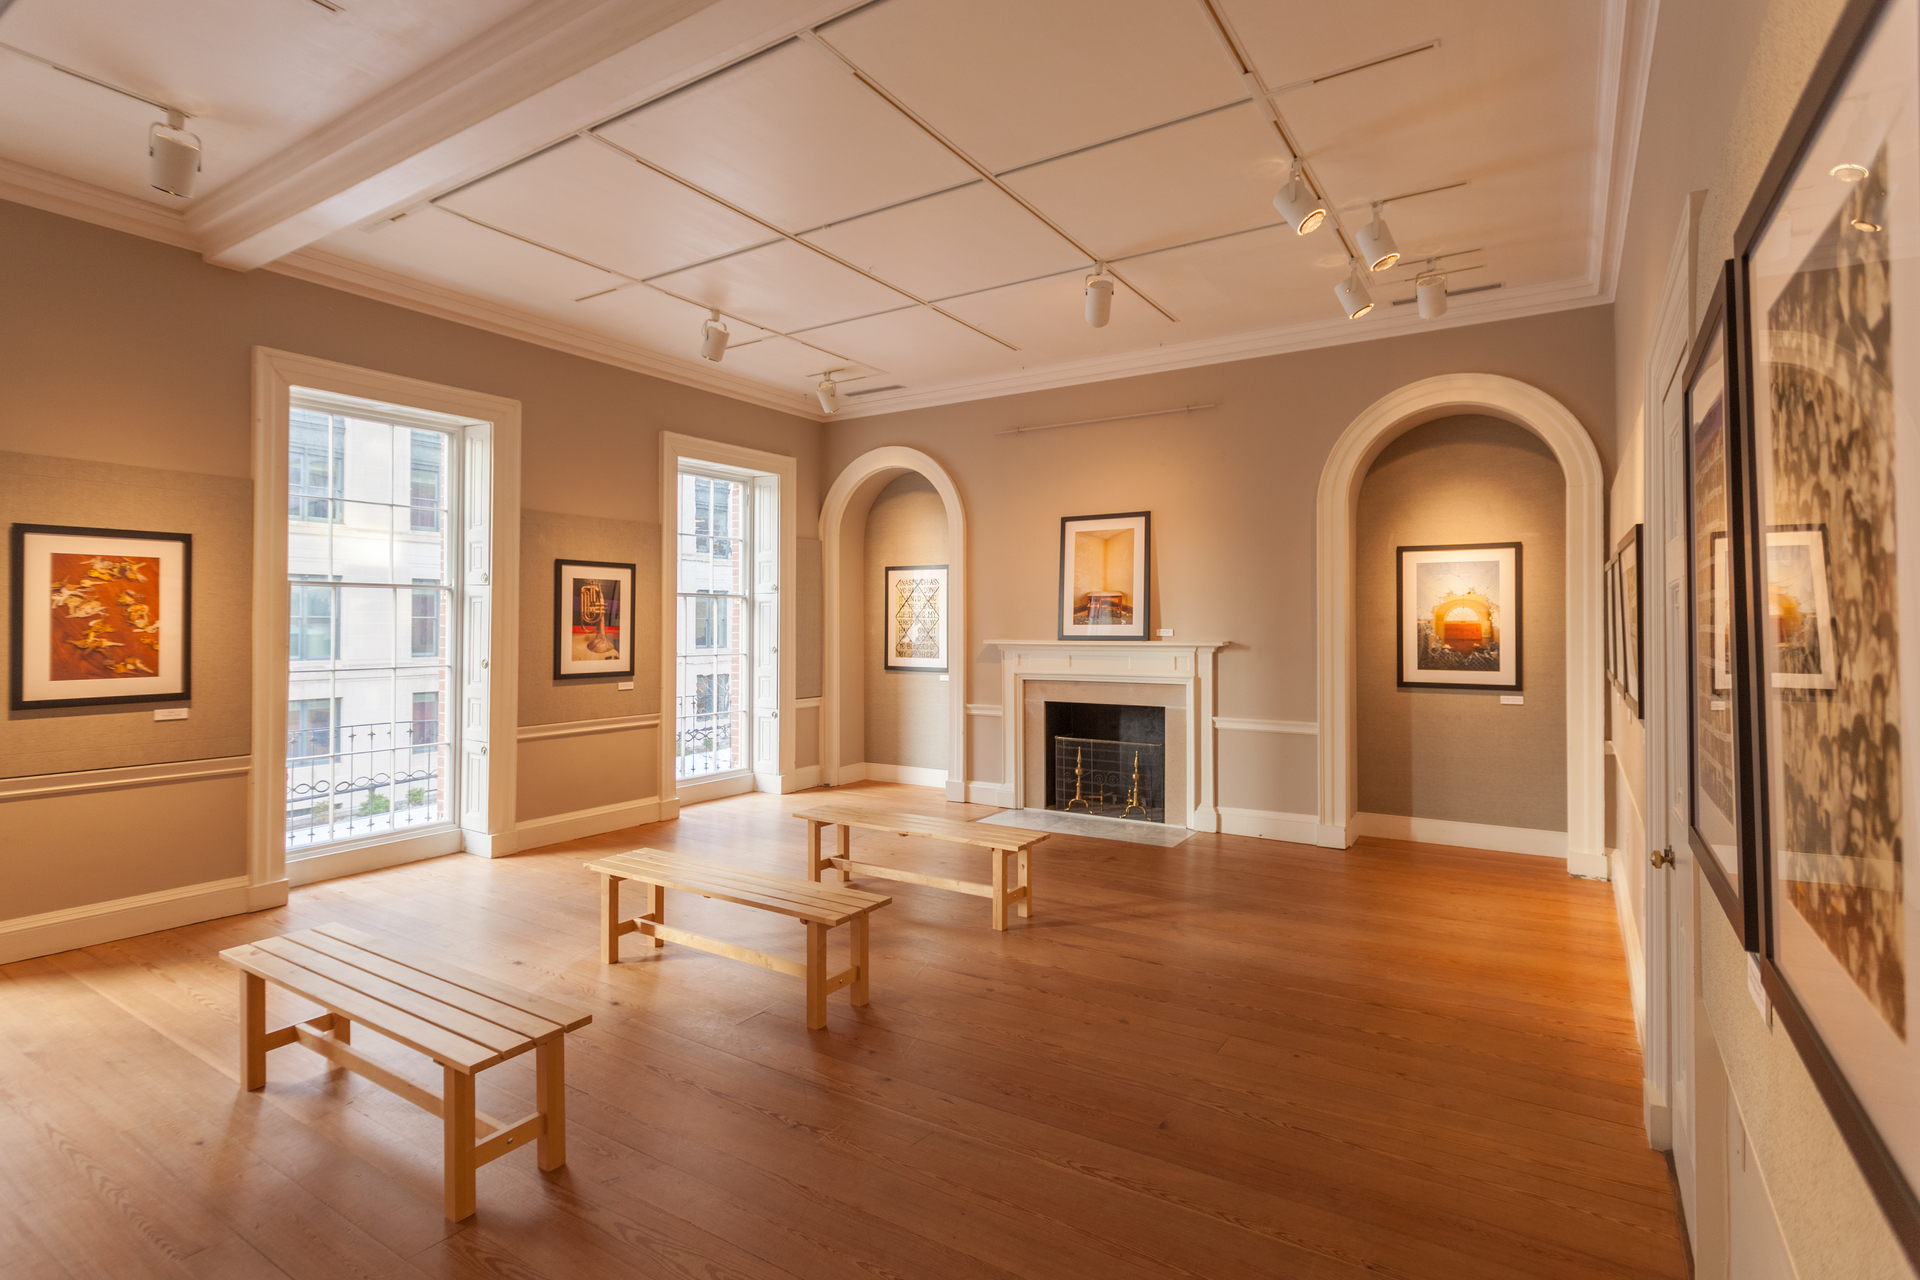 The Octagon Washington DC 18th Street Gallery Windows and Spot Lights